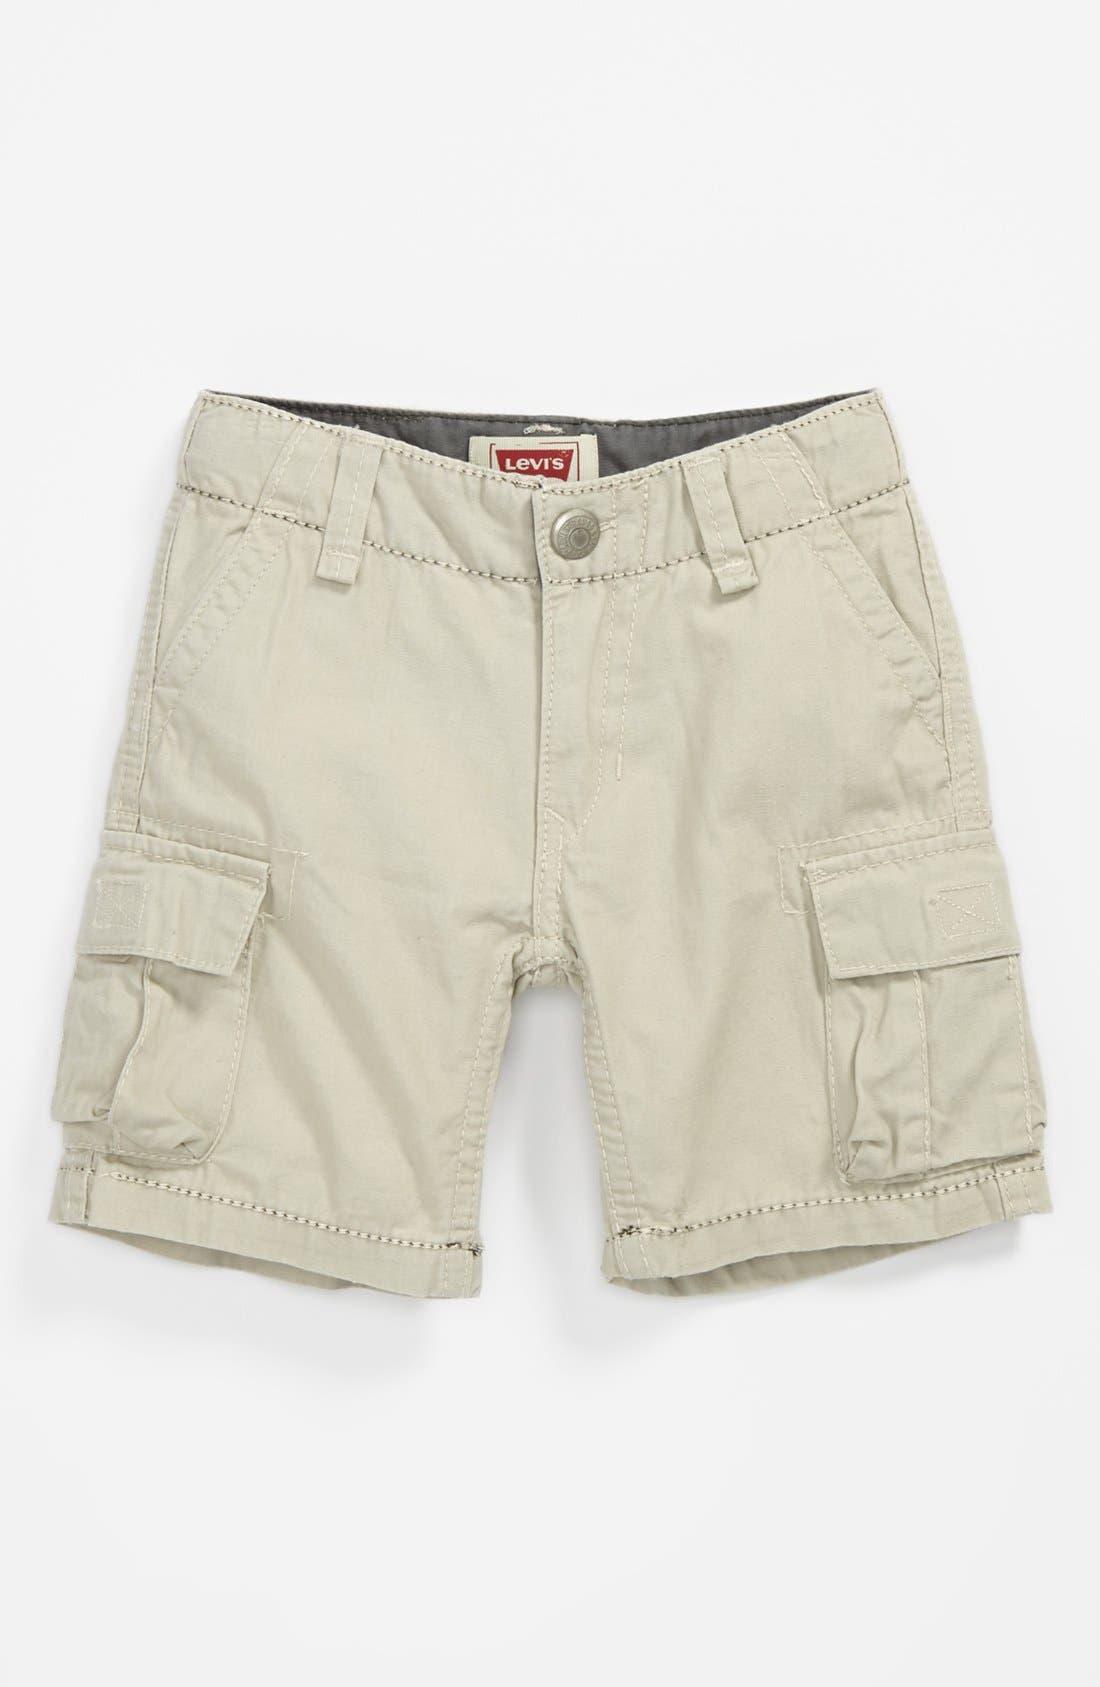 Alternate Image 1 Selected - Levi's® 'Troop' Cargo Shorts (Toddler Boys)